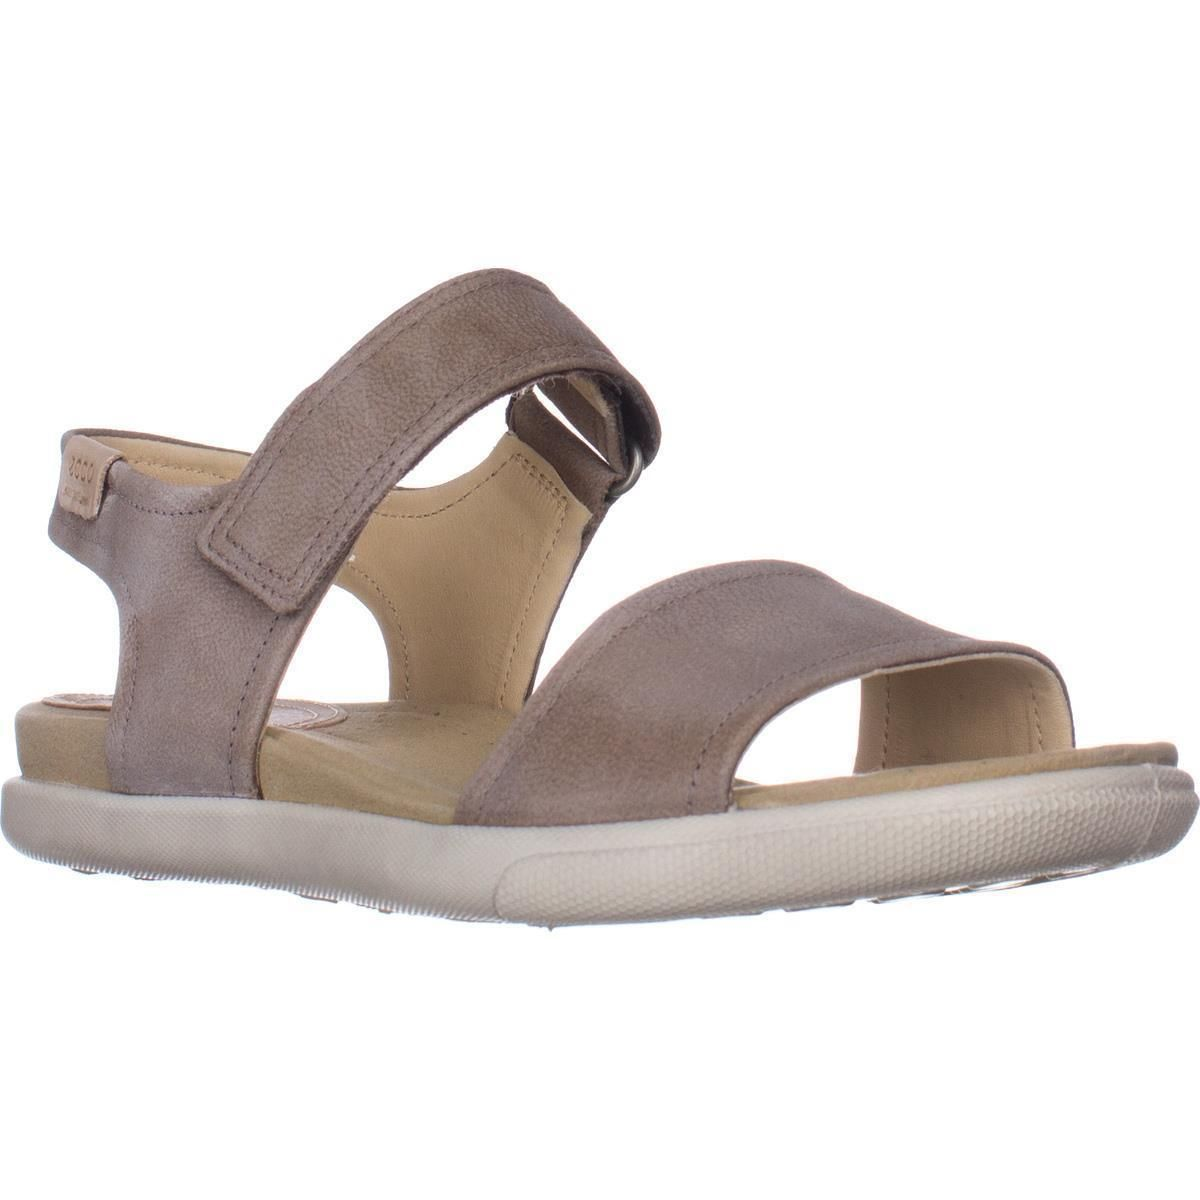 0c00e024f93e ECCO Damara Flat Comfort Sandals